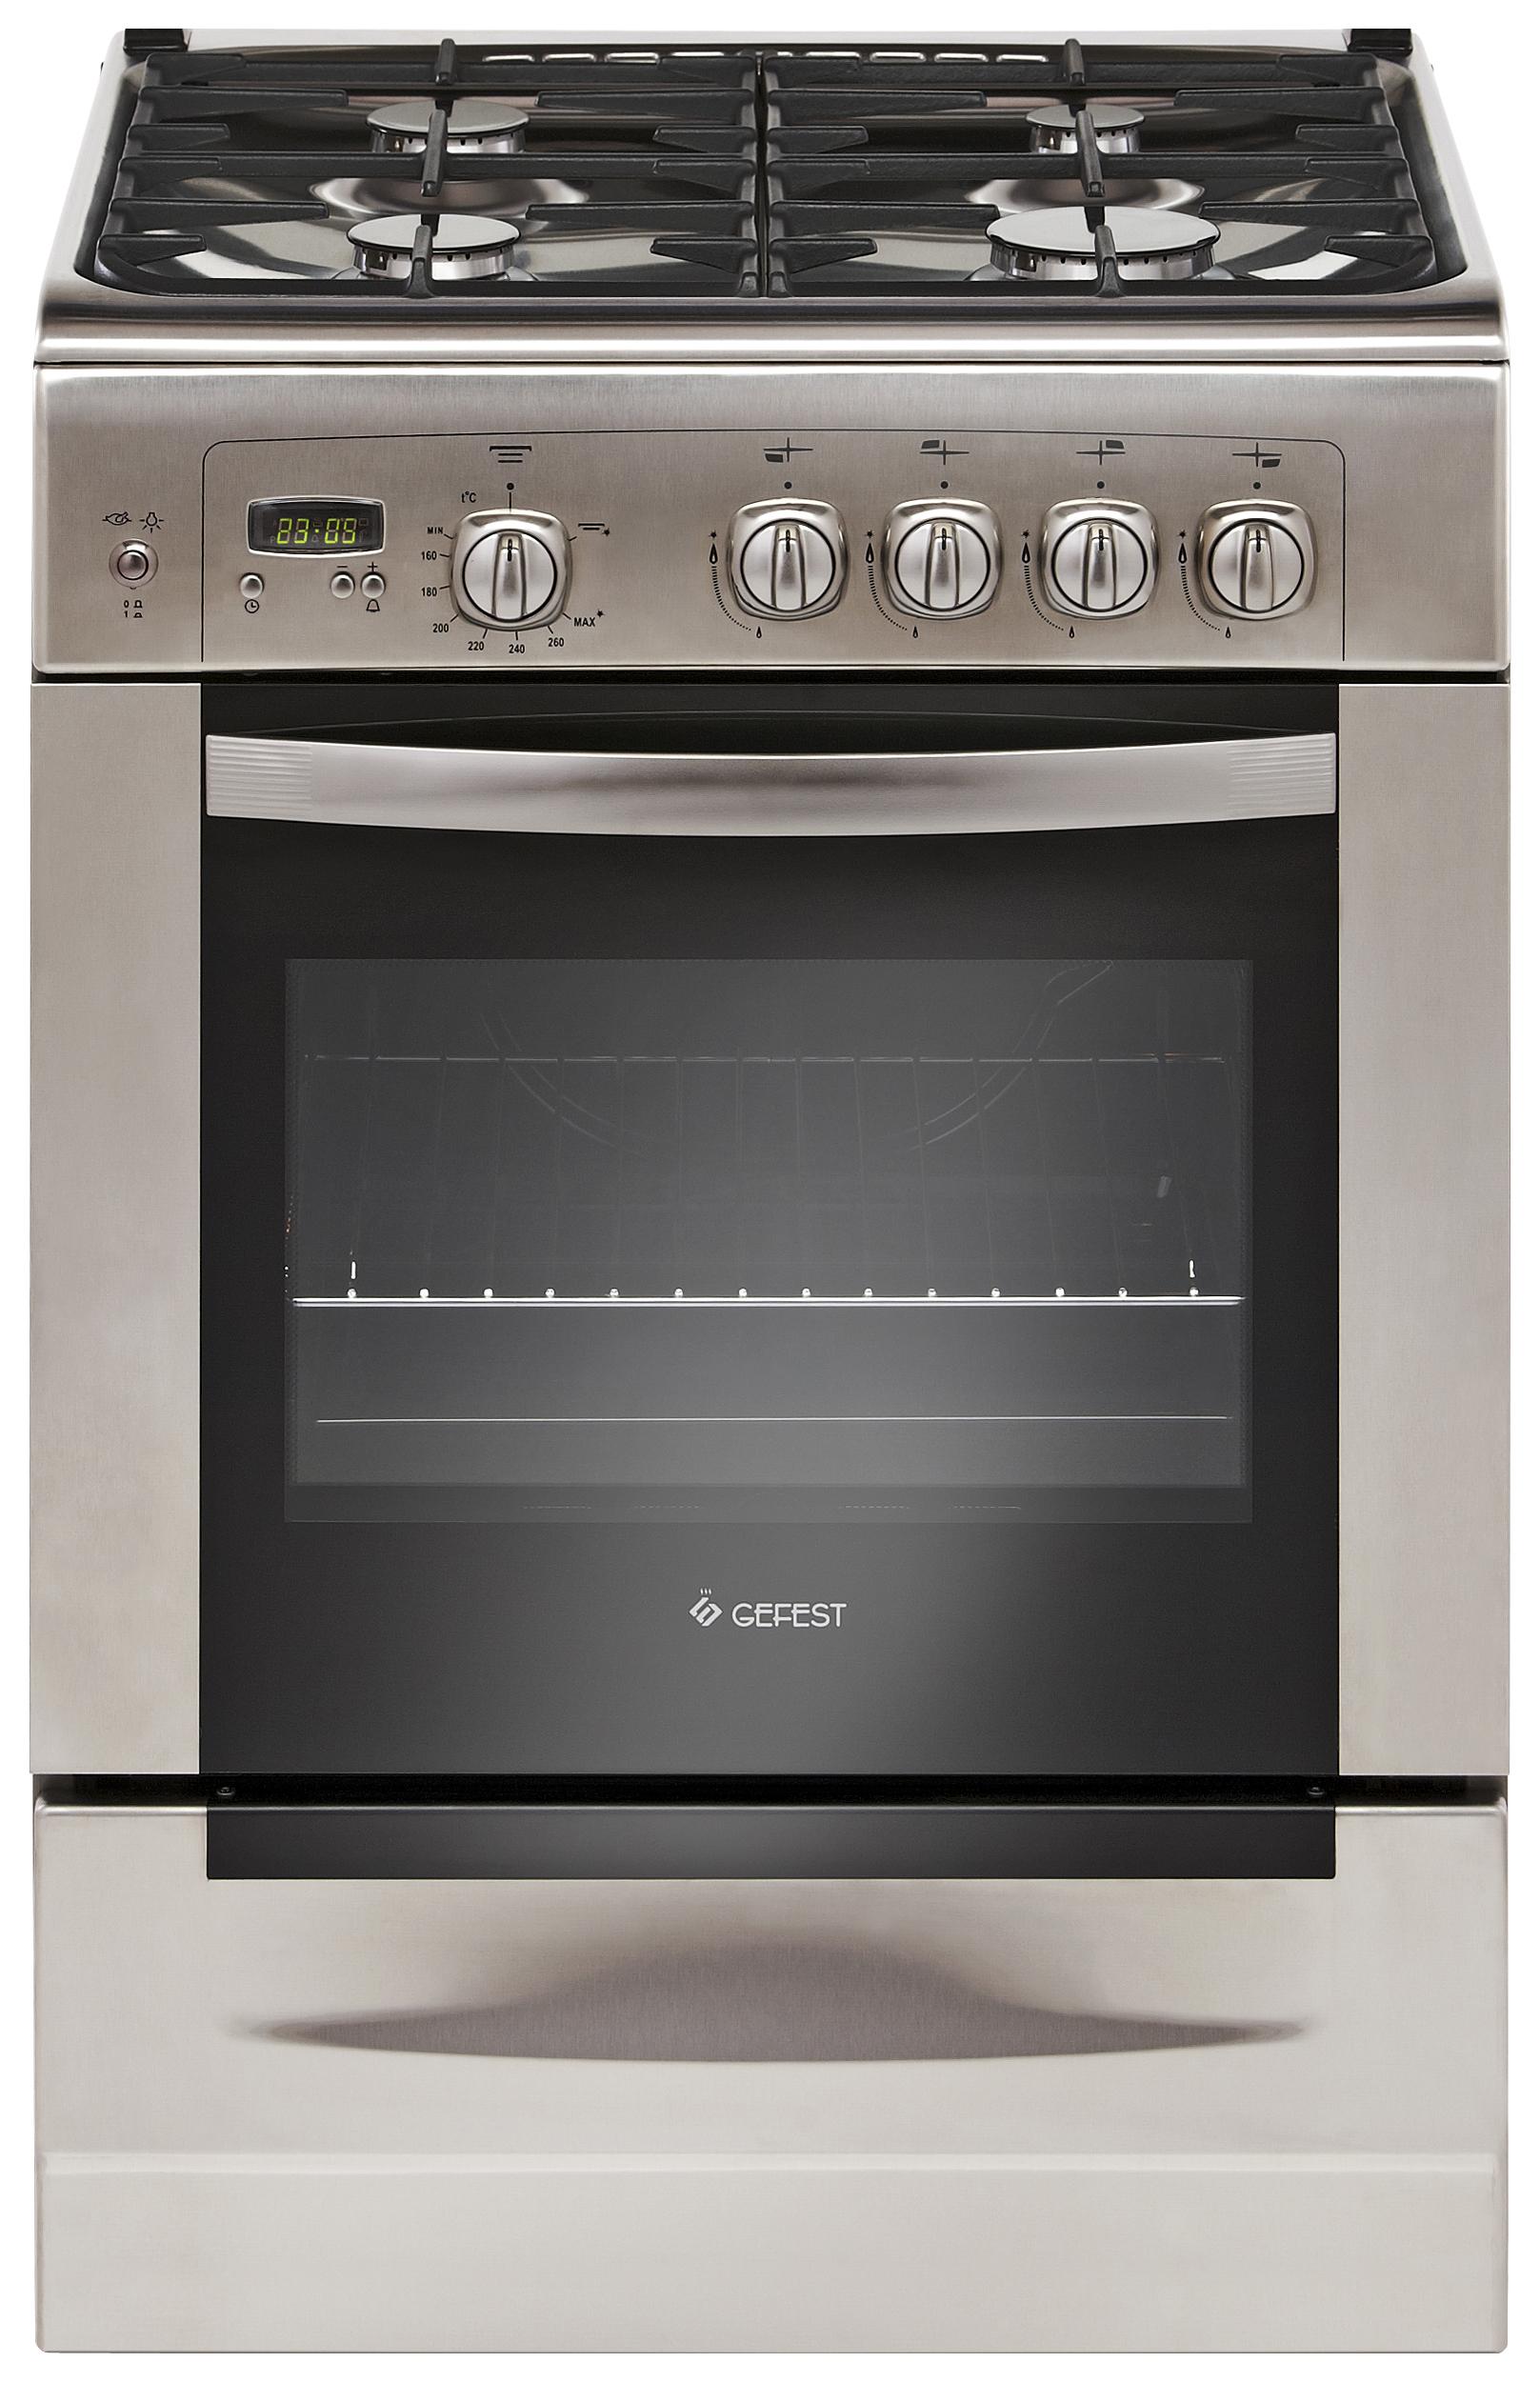 Газовая плита GEFEST ПГ 6100-03 0004 Silver